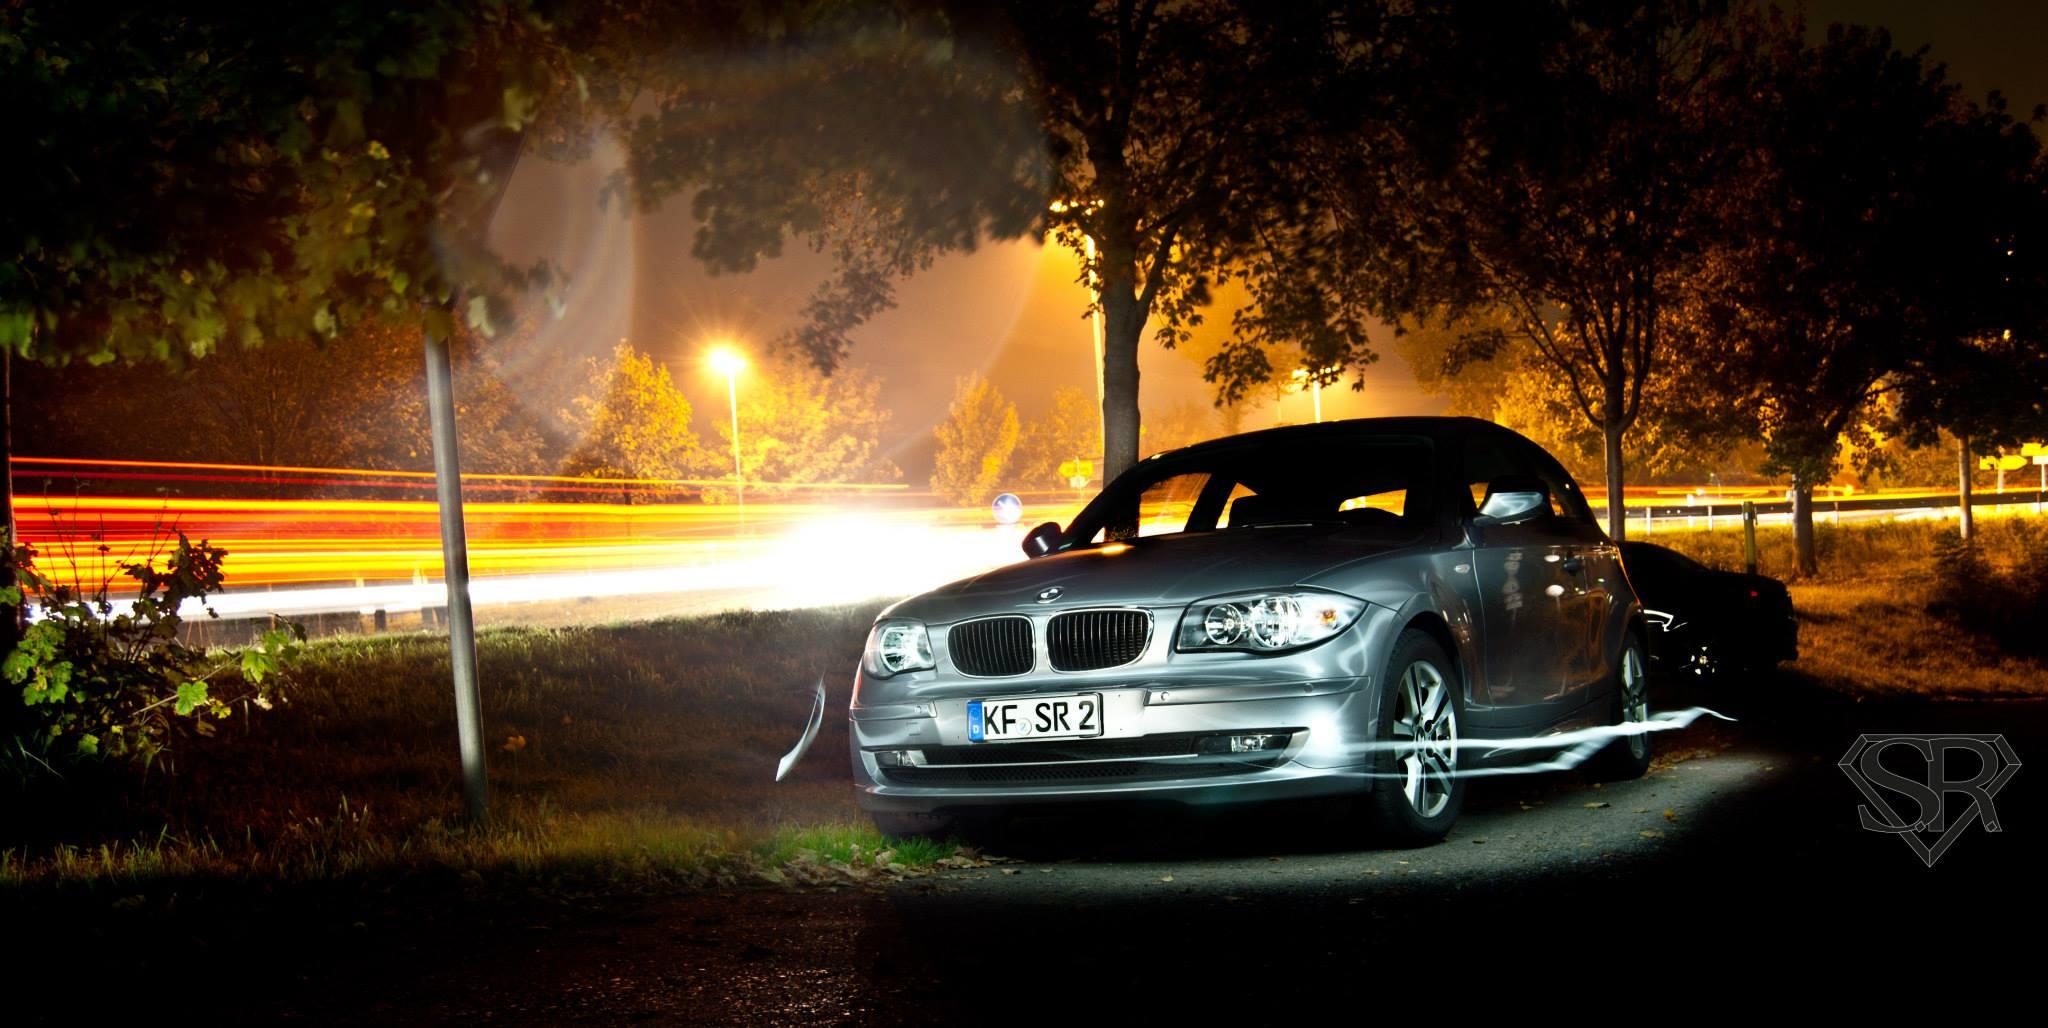 #1er#light the night#S.R.photography ;)